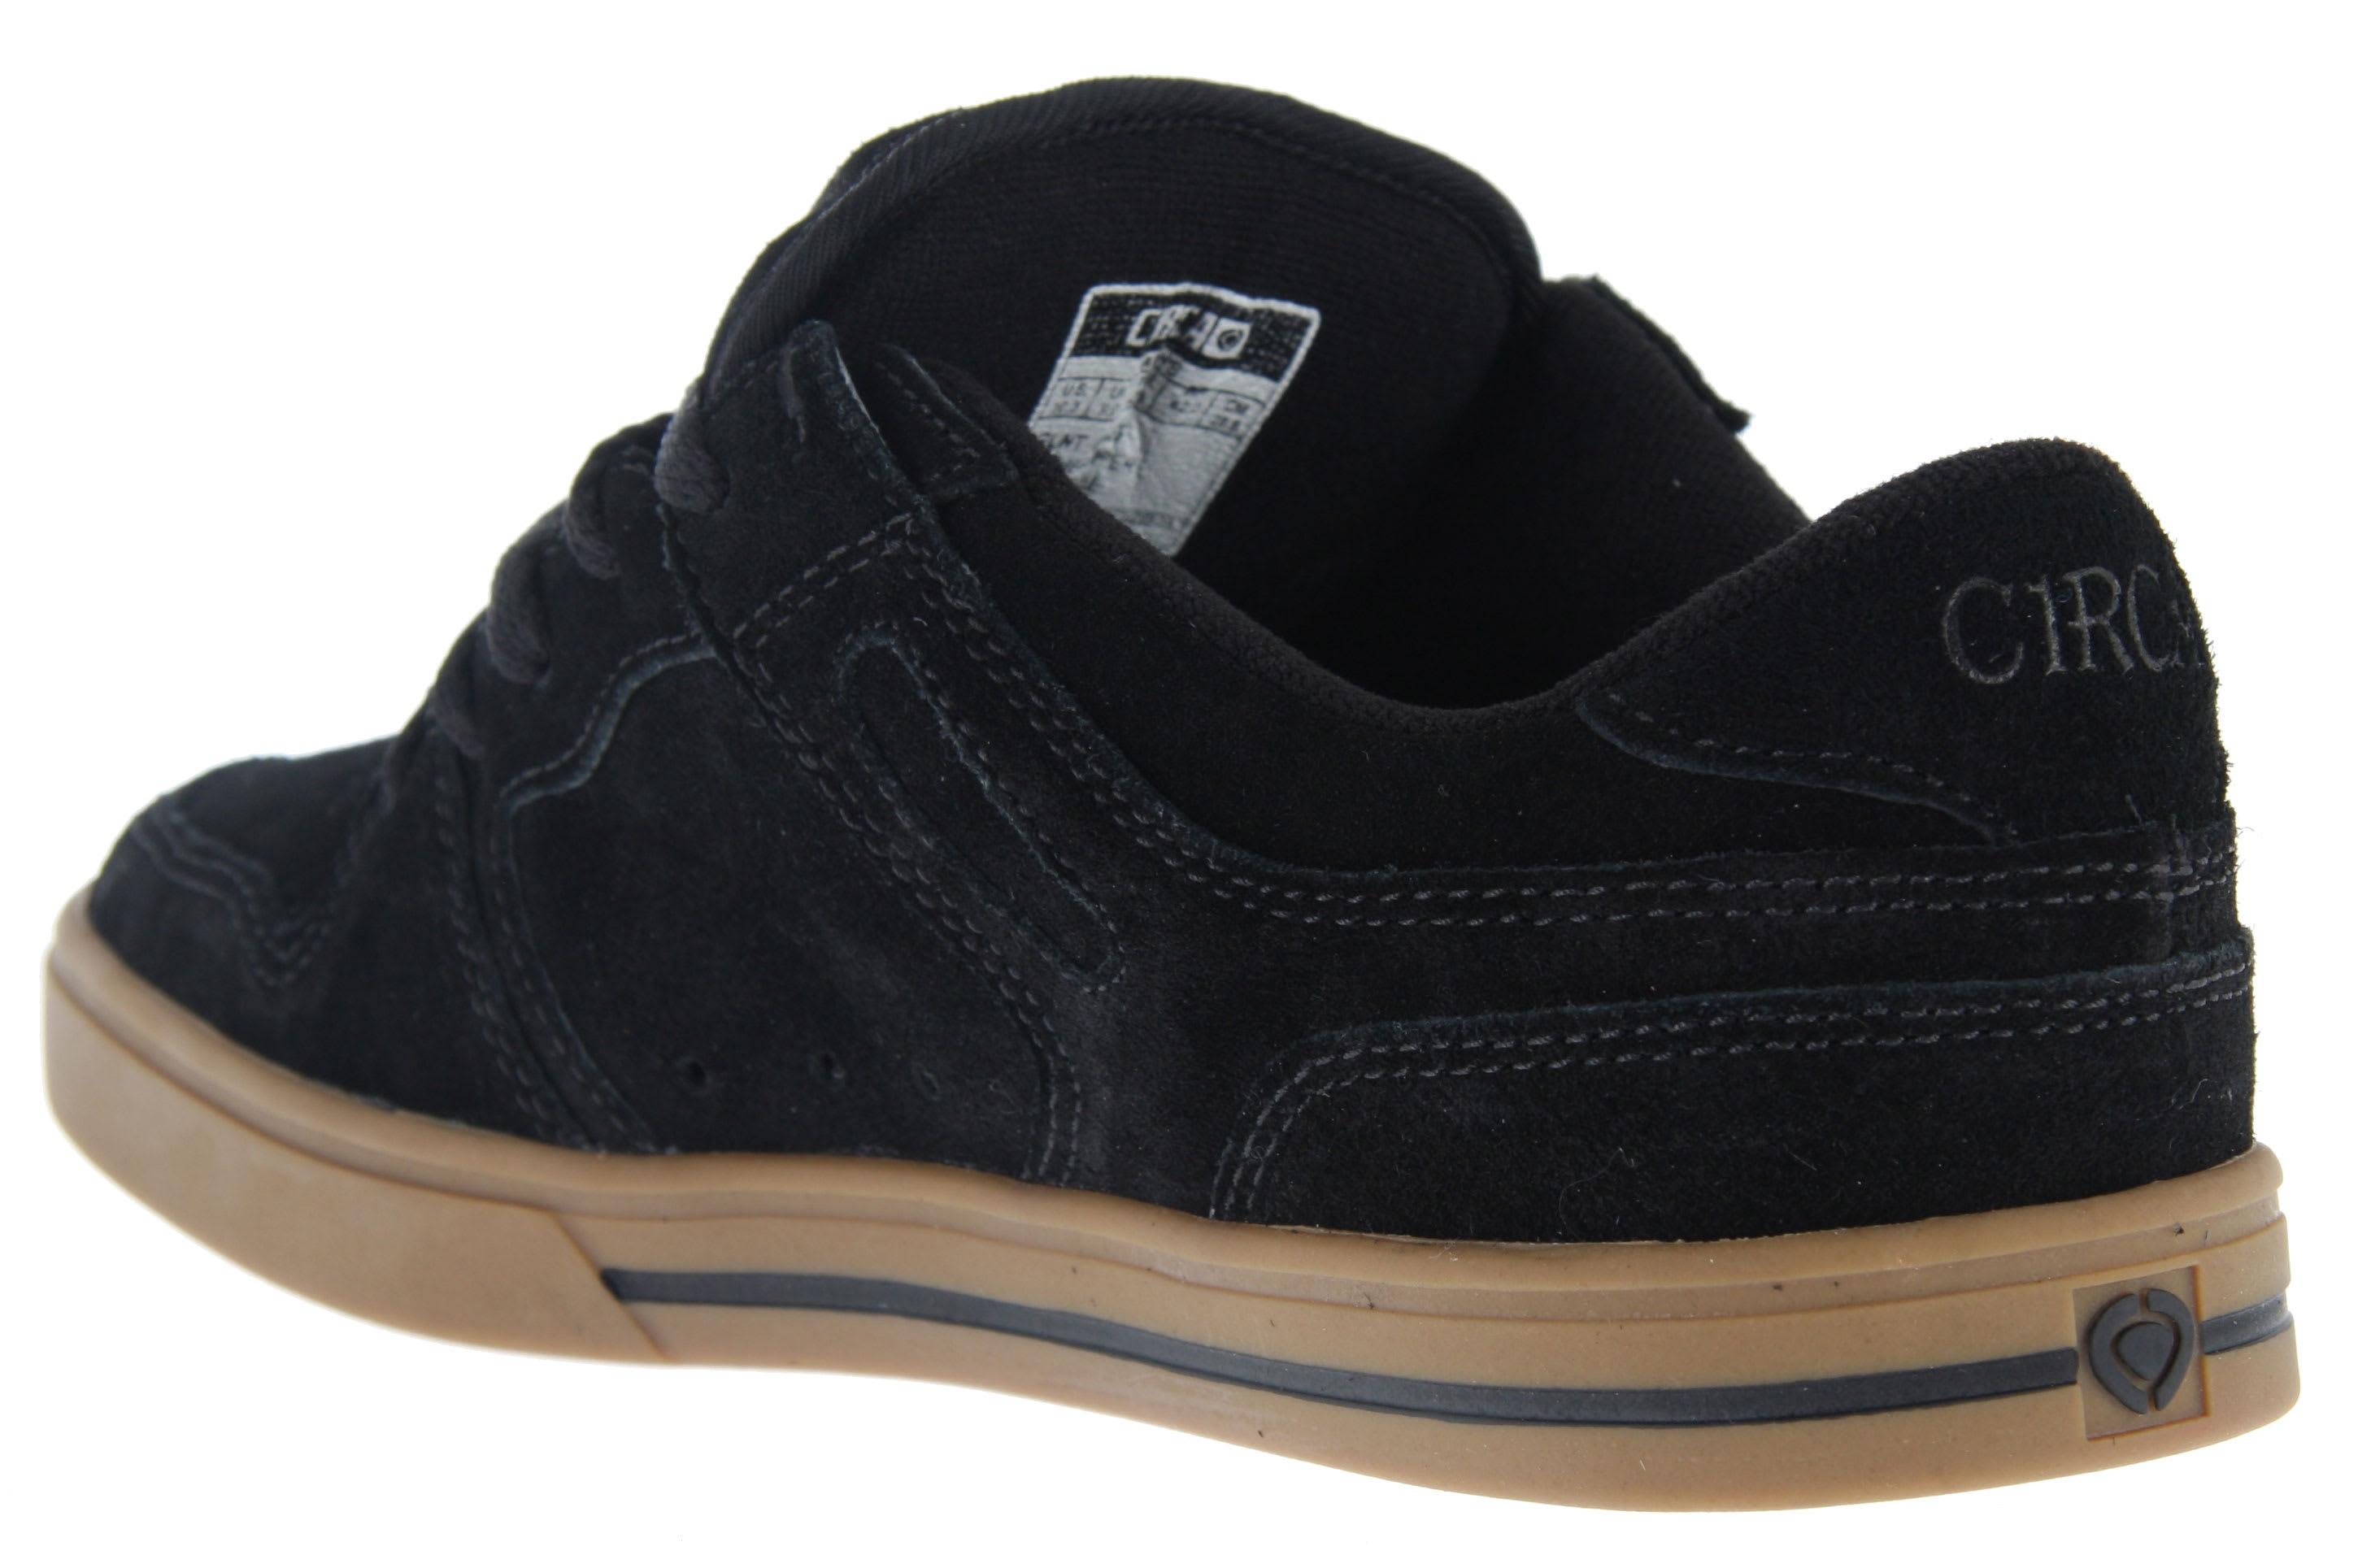 Circa Gallant Skate Shoes